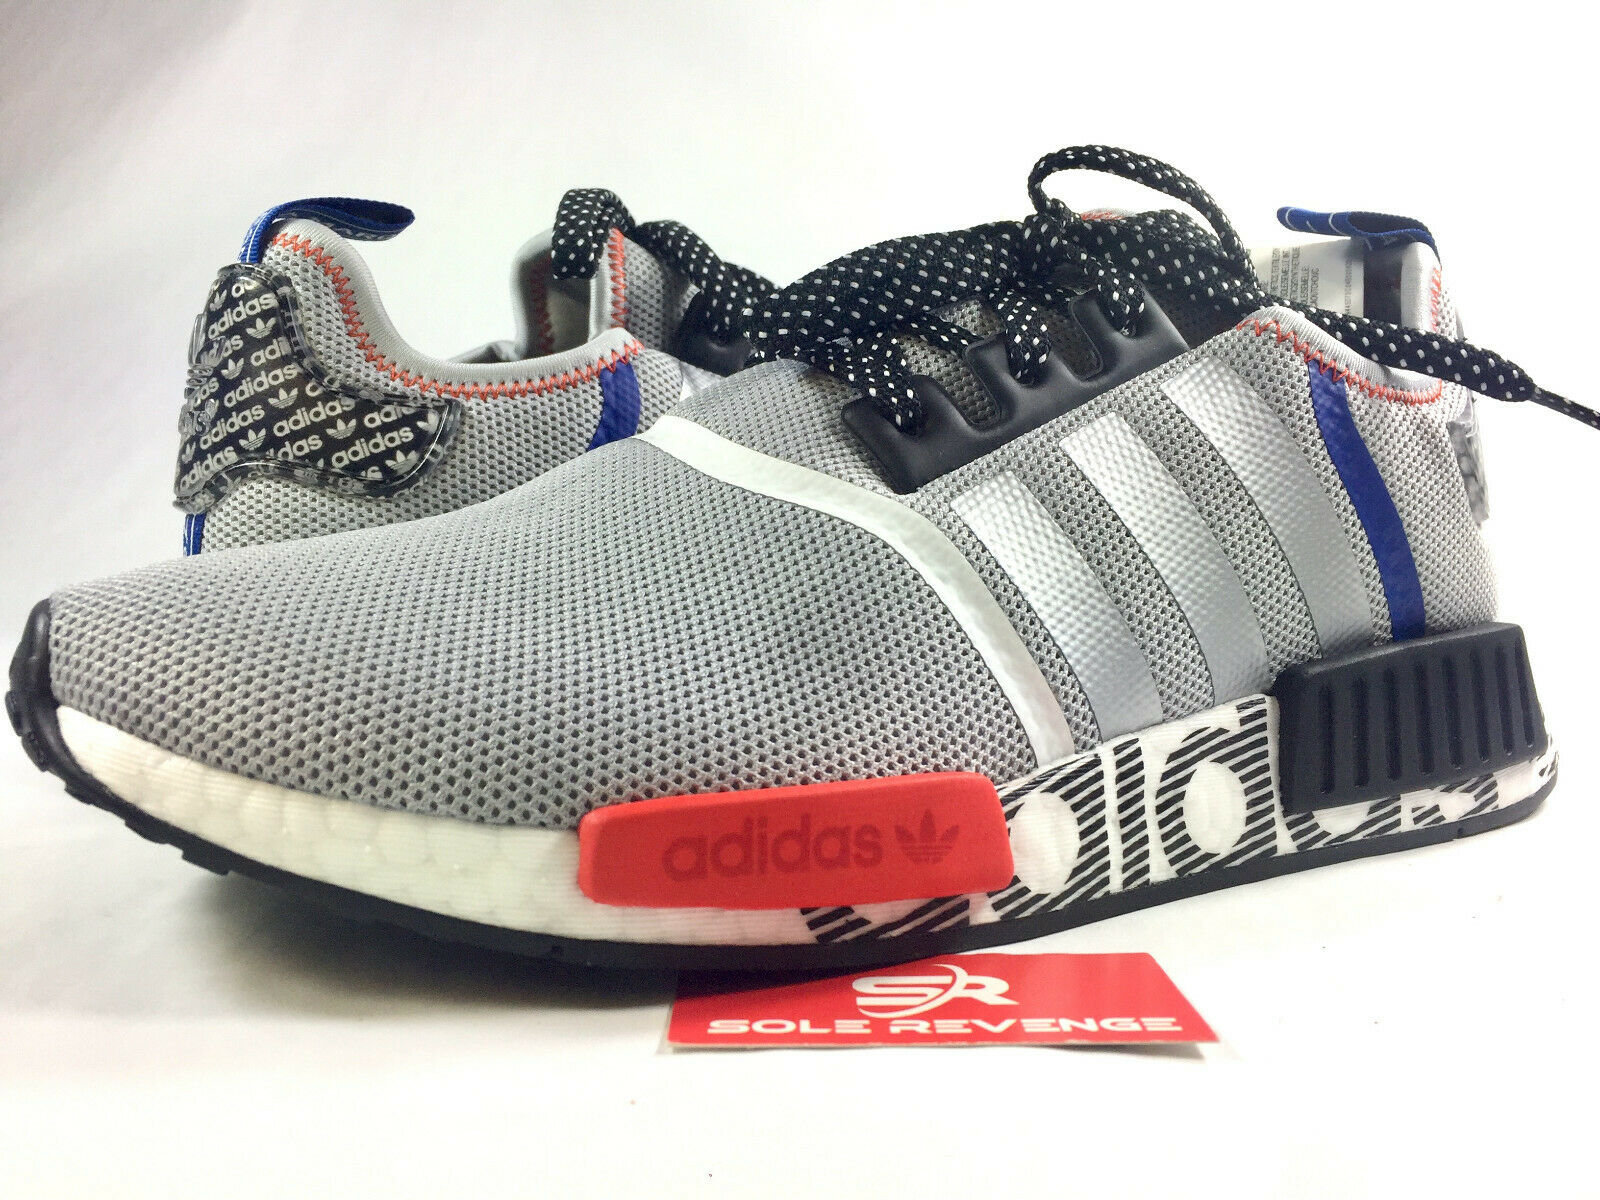 adidas Barricade 8+ sneak peek | Adidas barricade, Adidas, Shoes